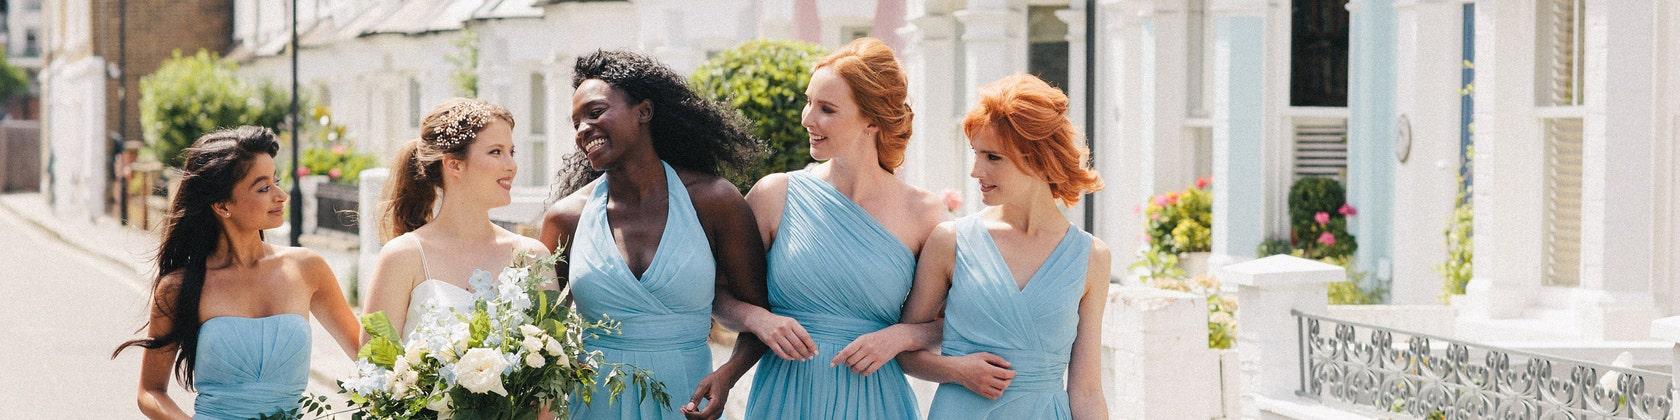 Perfectly Matching Wedding Clothing Bridesmaid von Matchimony